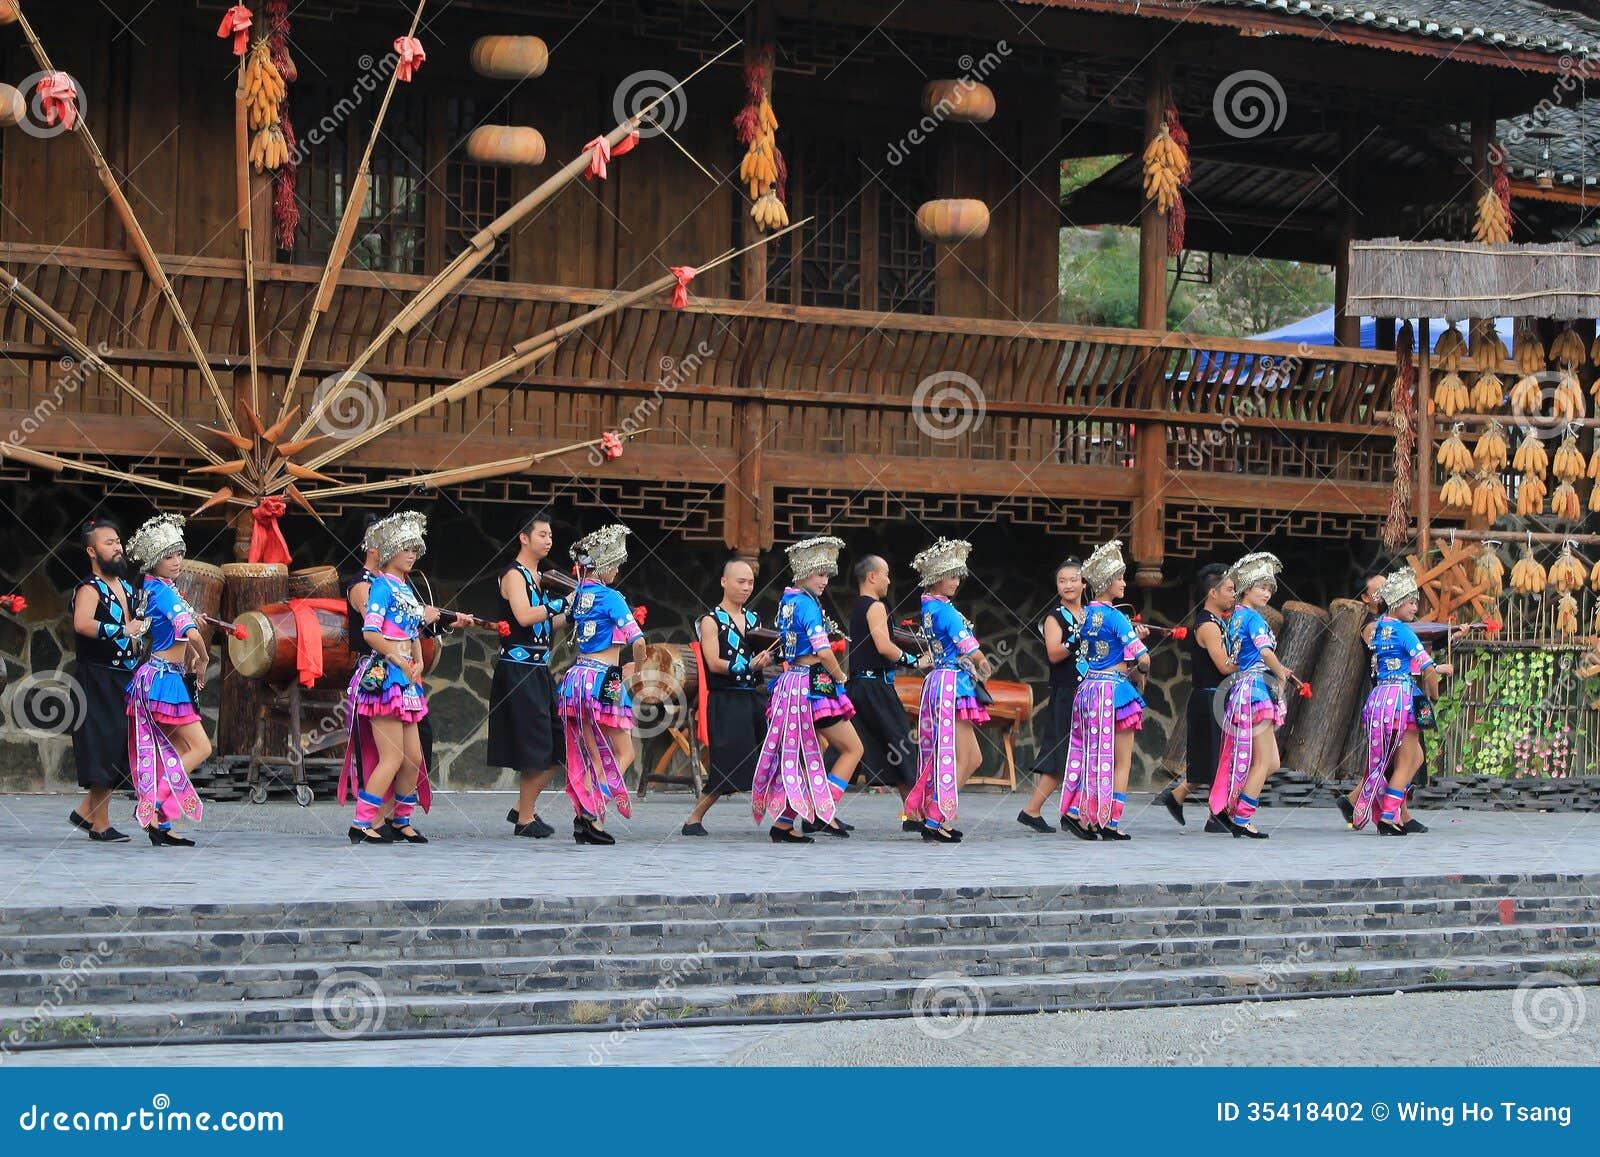 Crowd, performing, arts, recreation, festival, event, fun, performance, folk, dance, leisure, art